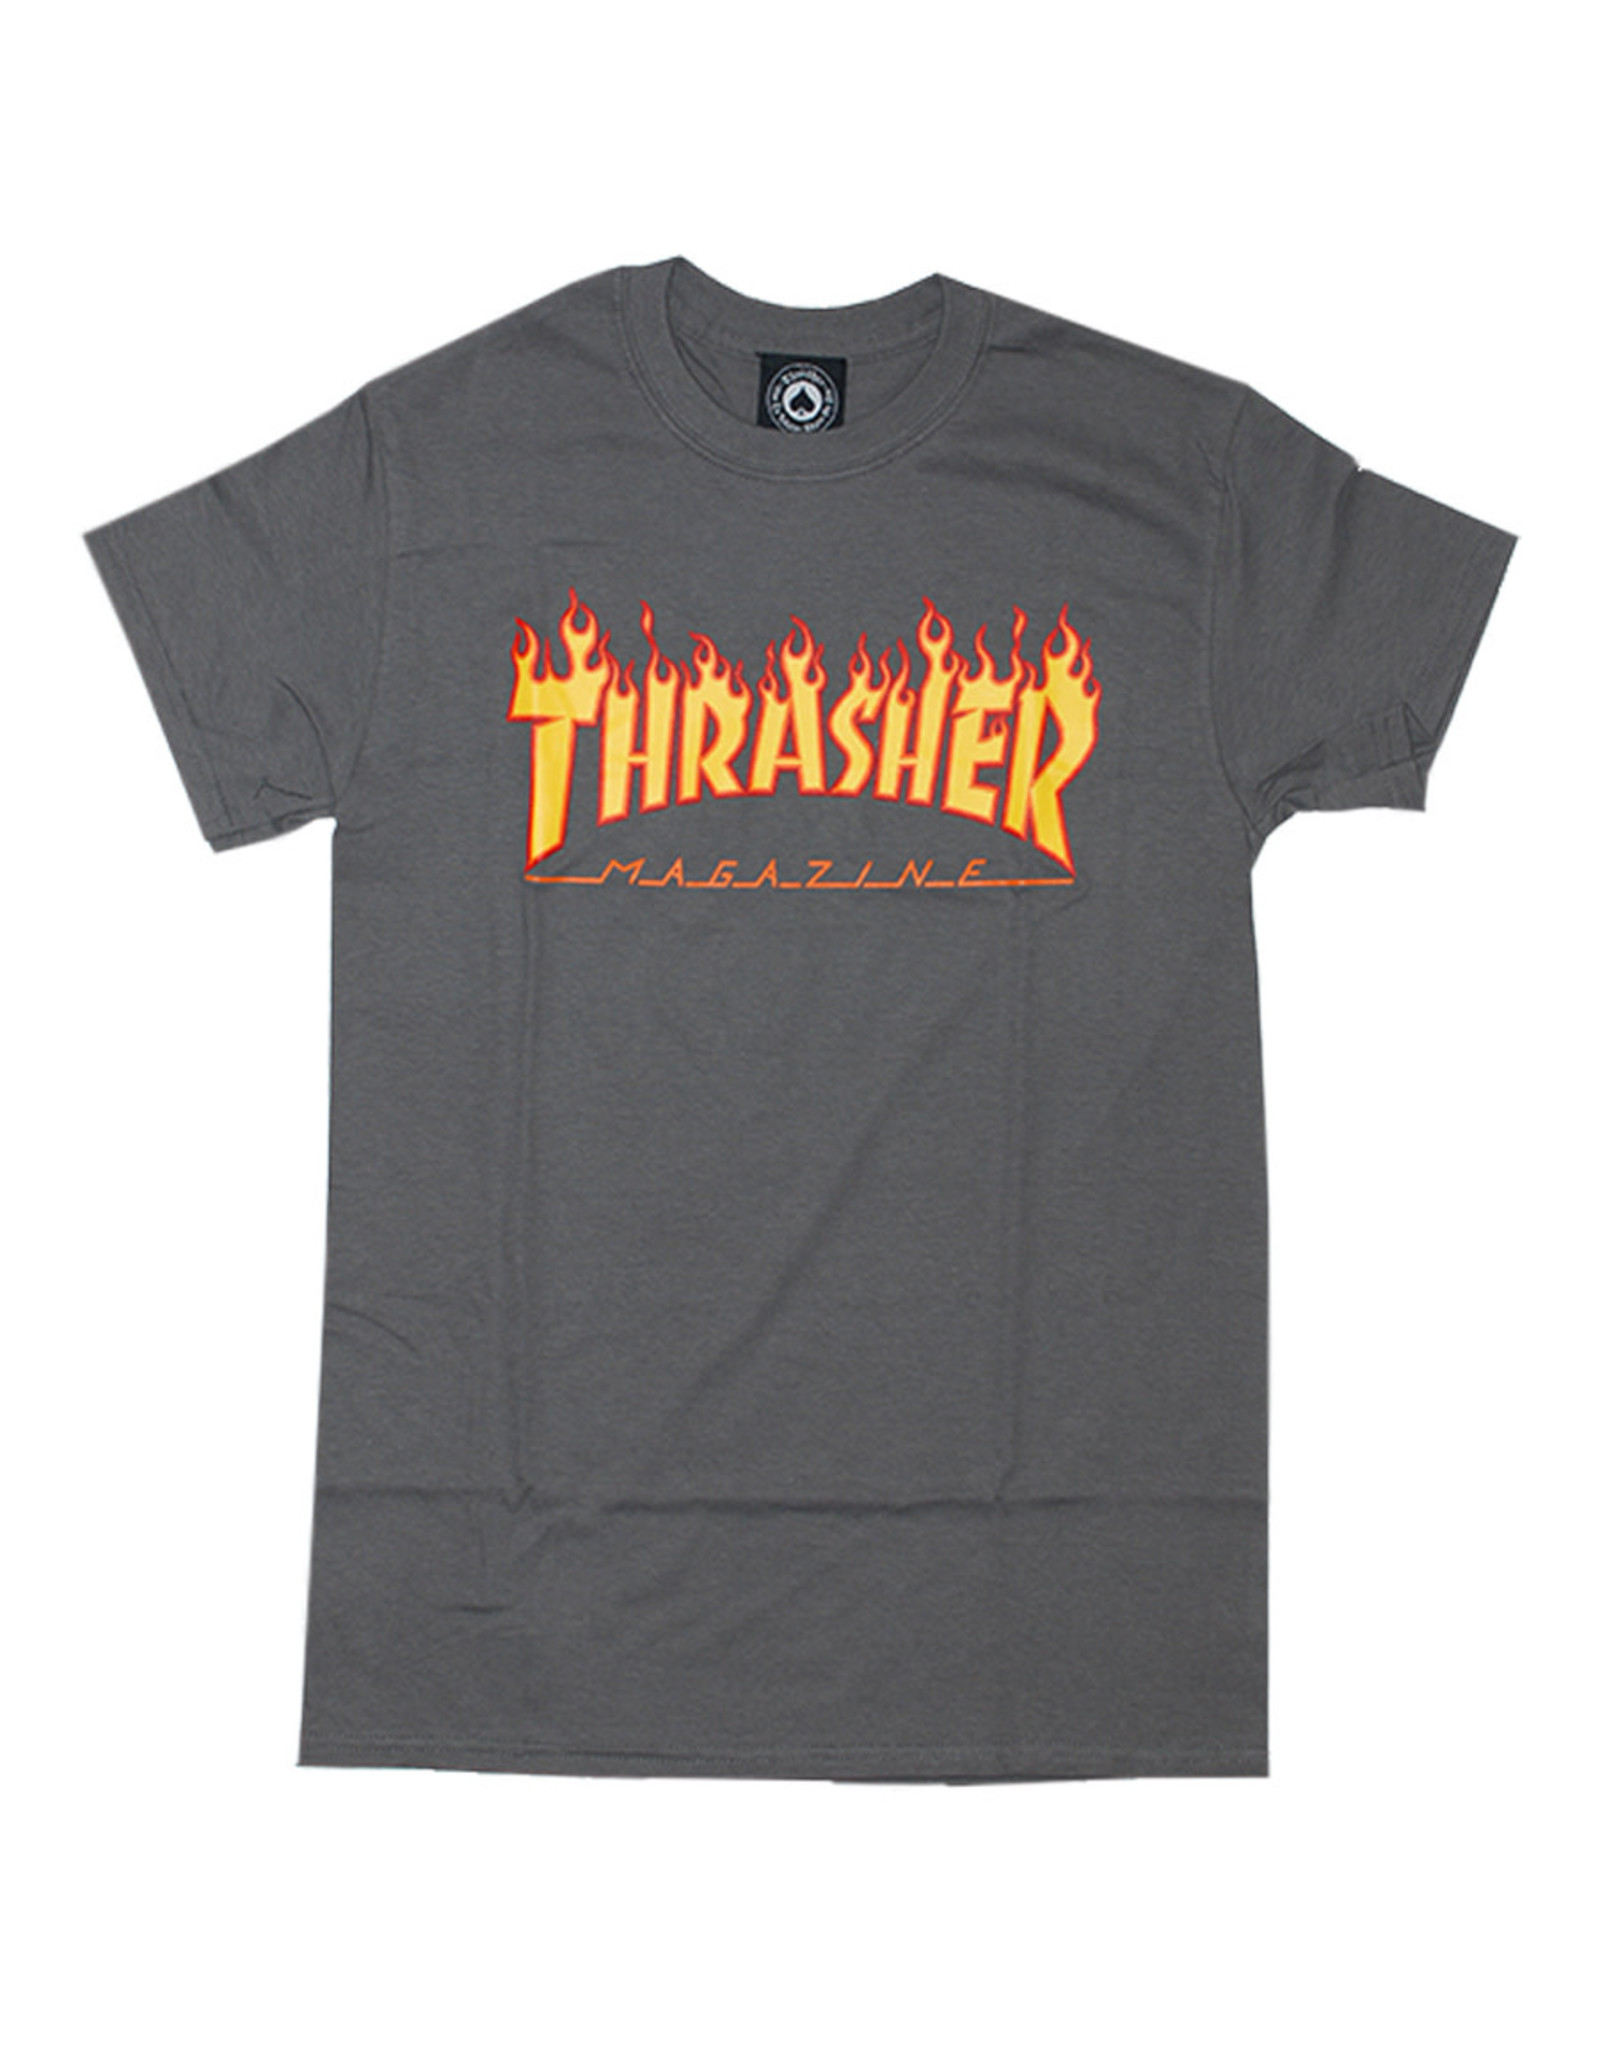 Thrasher Thrasher Tee Mens Flame Logo S/S (Charcoal Grey)